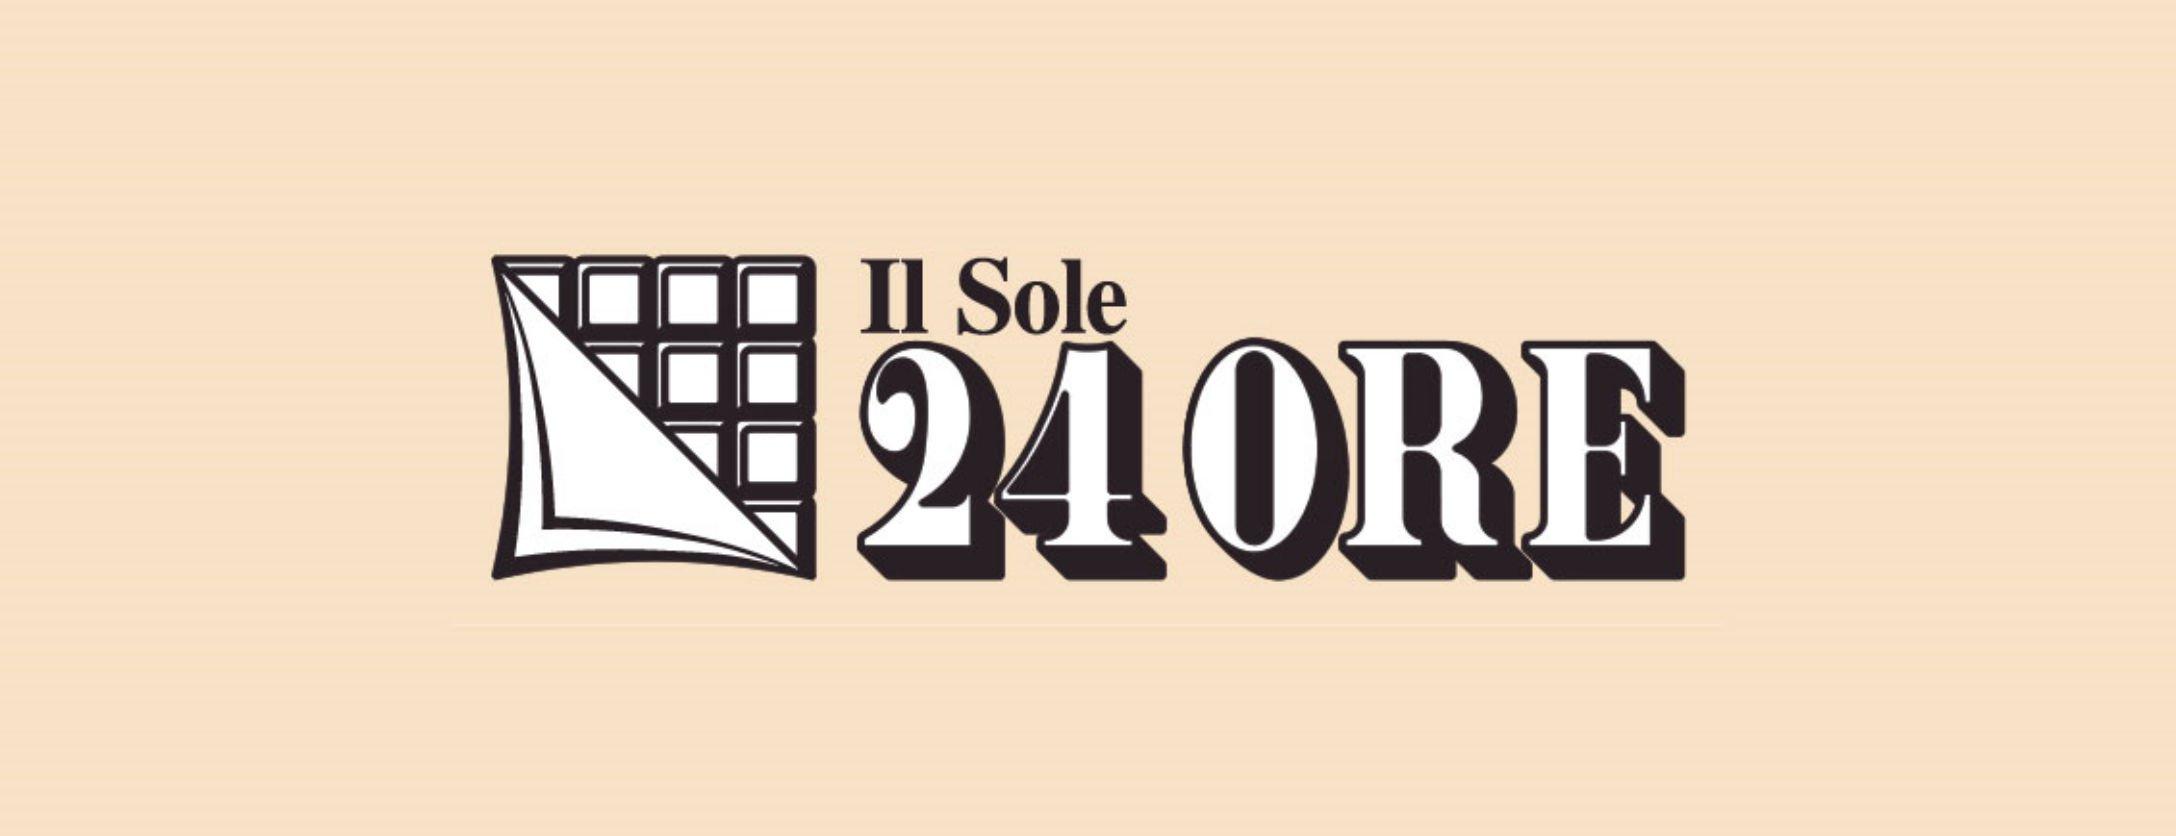 Ilsole24ore